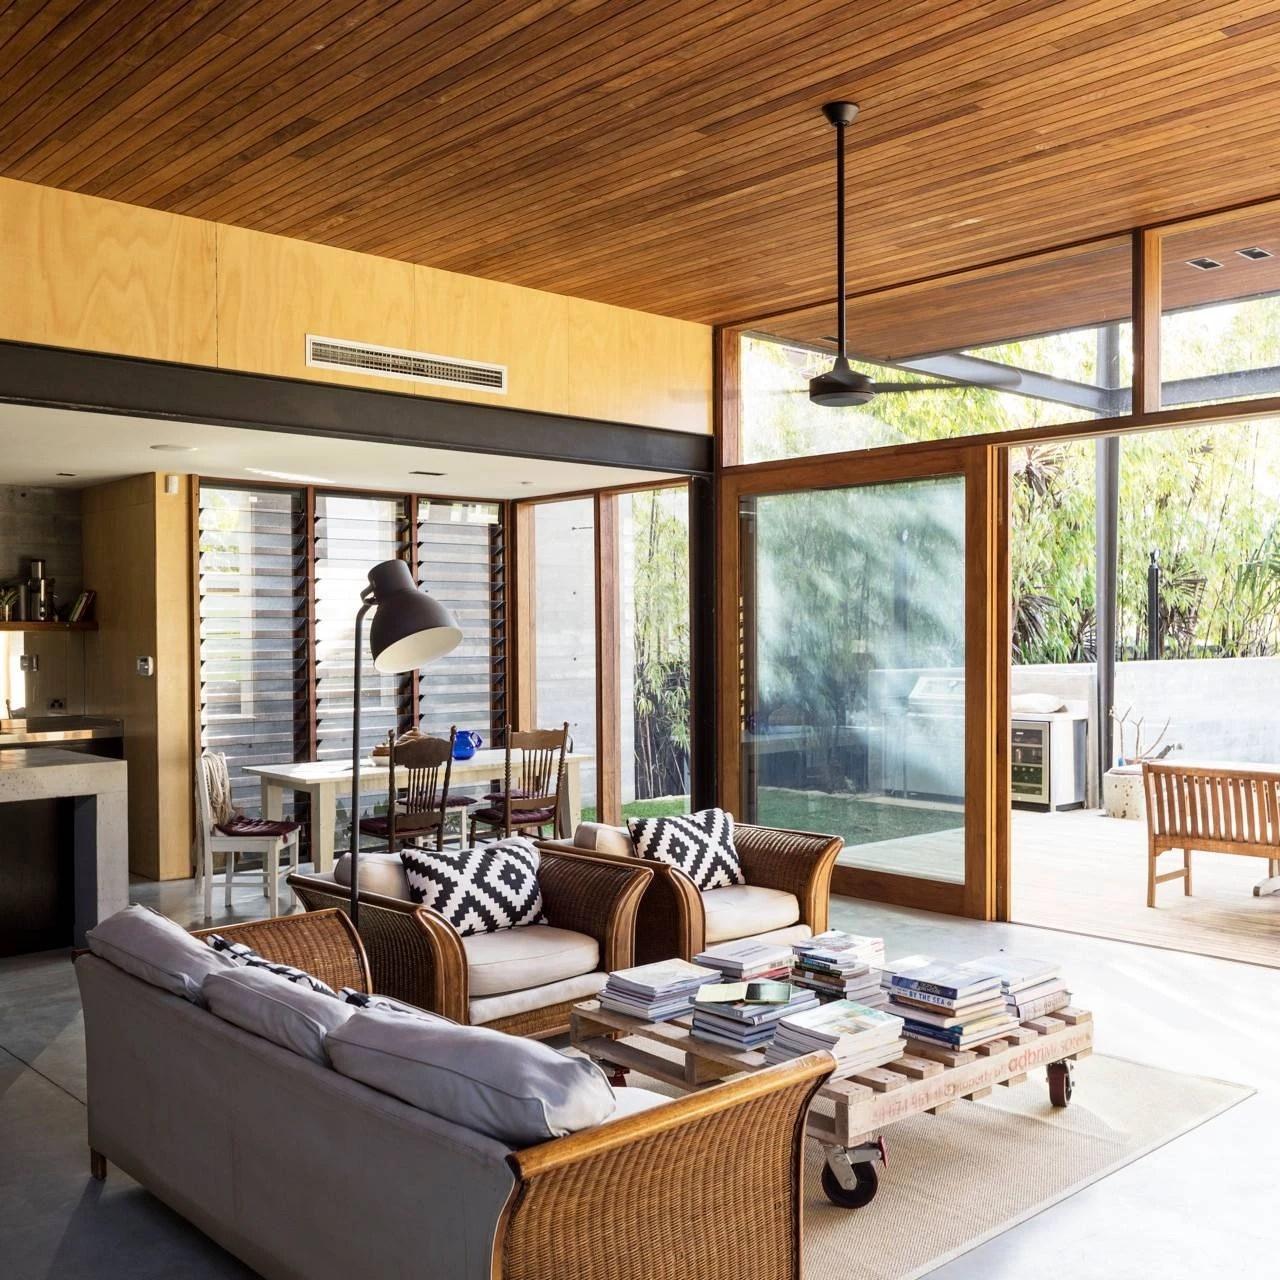 "Foto: Reprodução / <a href=""http://www.walterbardadesign.com/"" target=""_blank"">Walter Barda Design</a>"